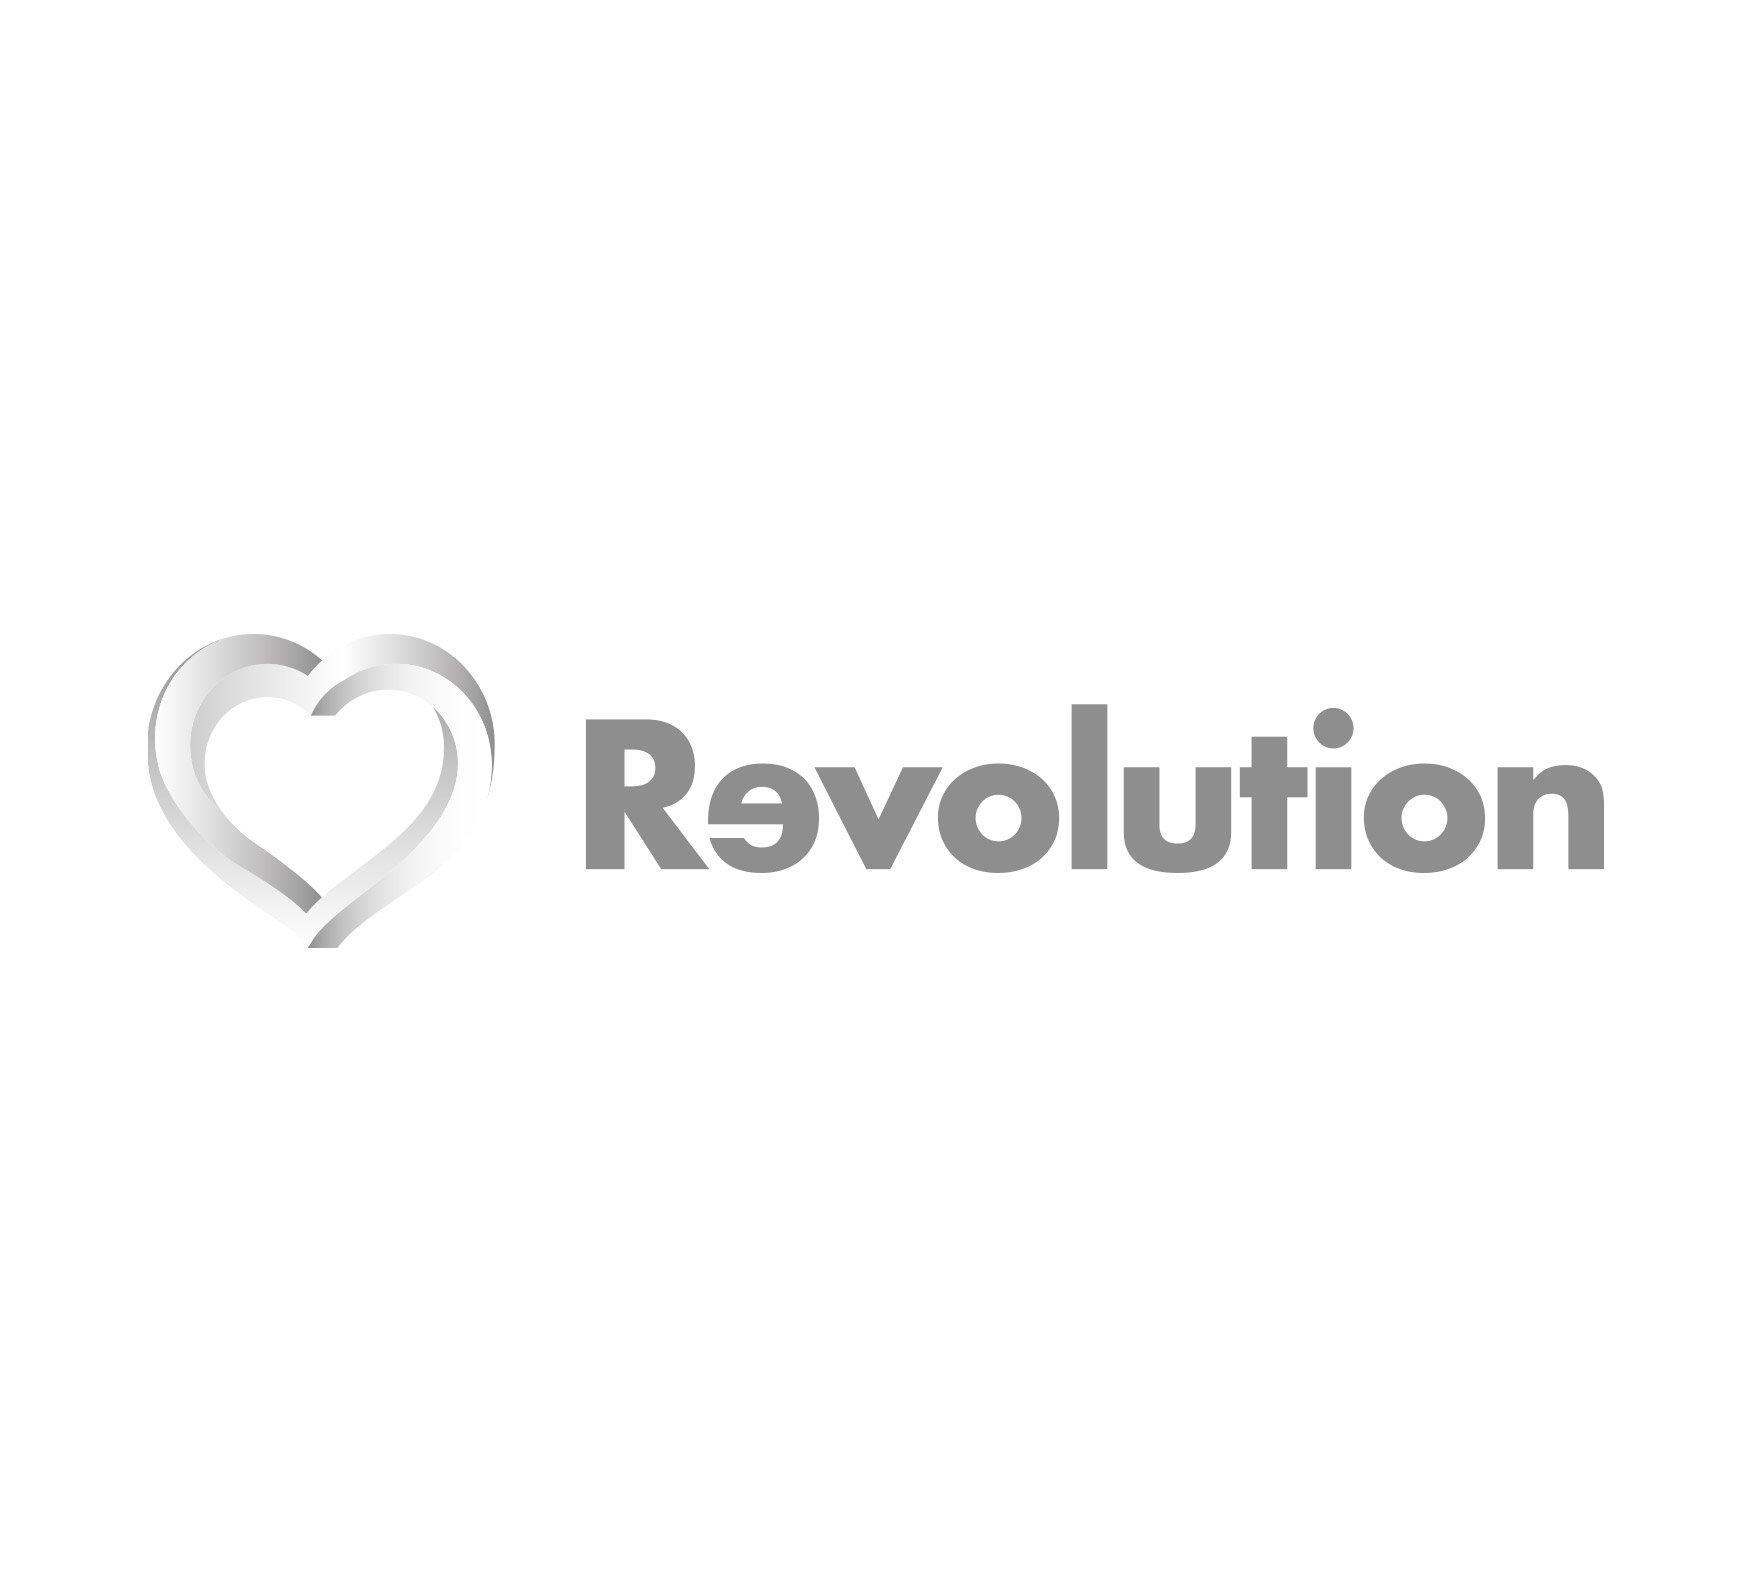 Revolution Logo Concepts 1